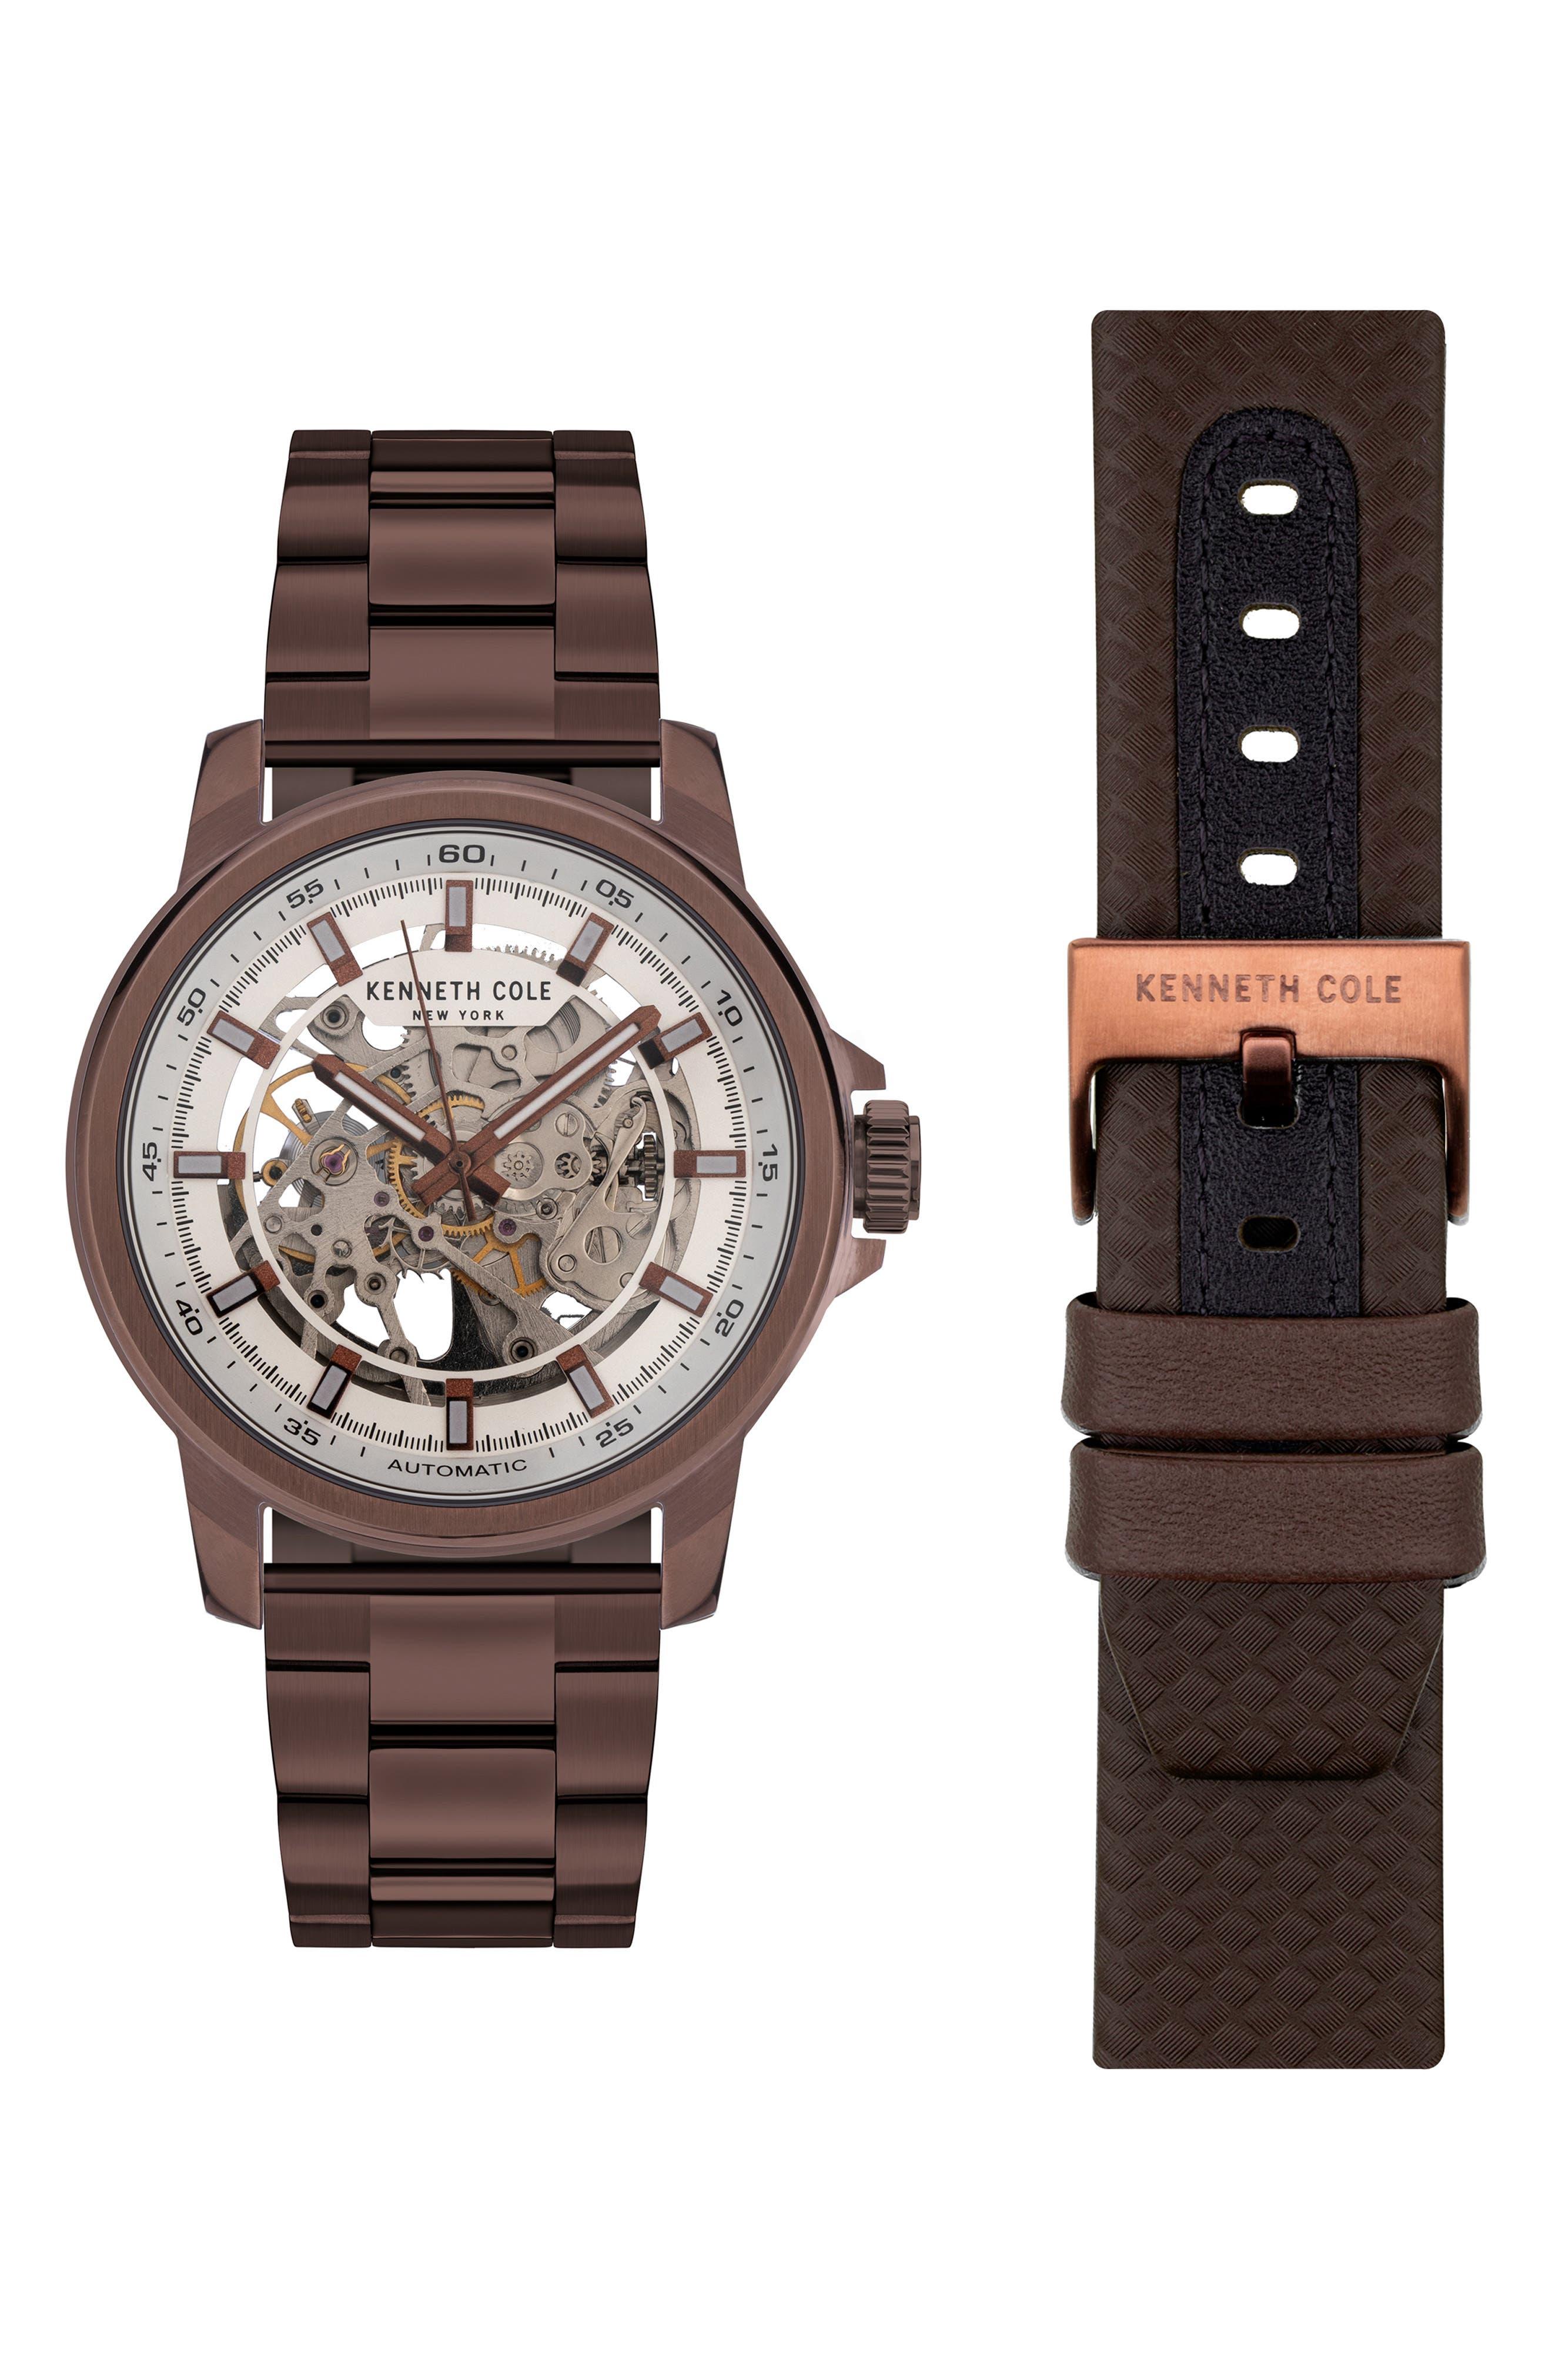 Skeletal Automatic Watch